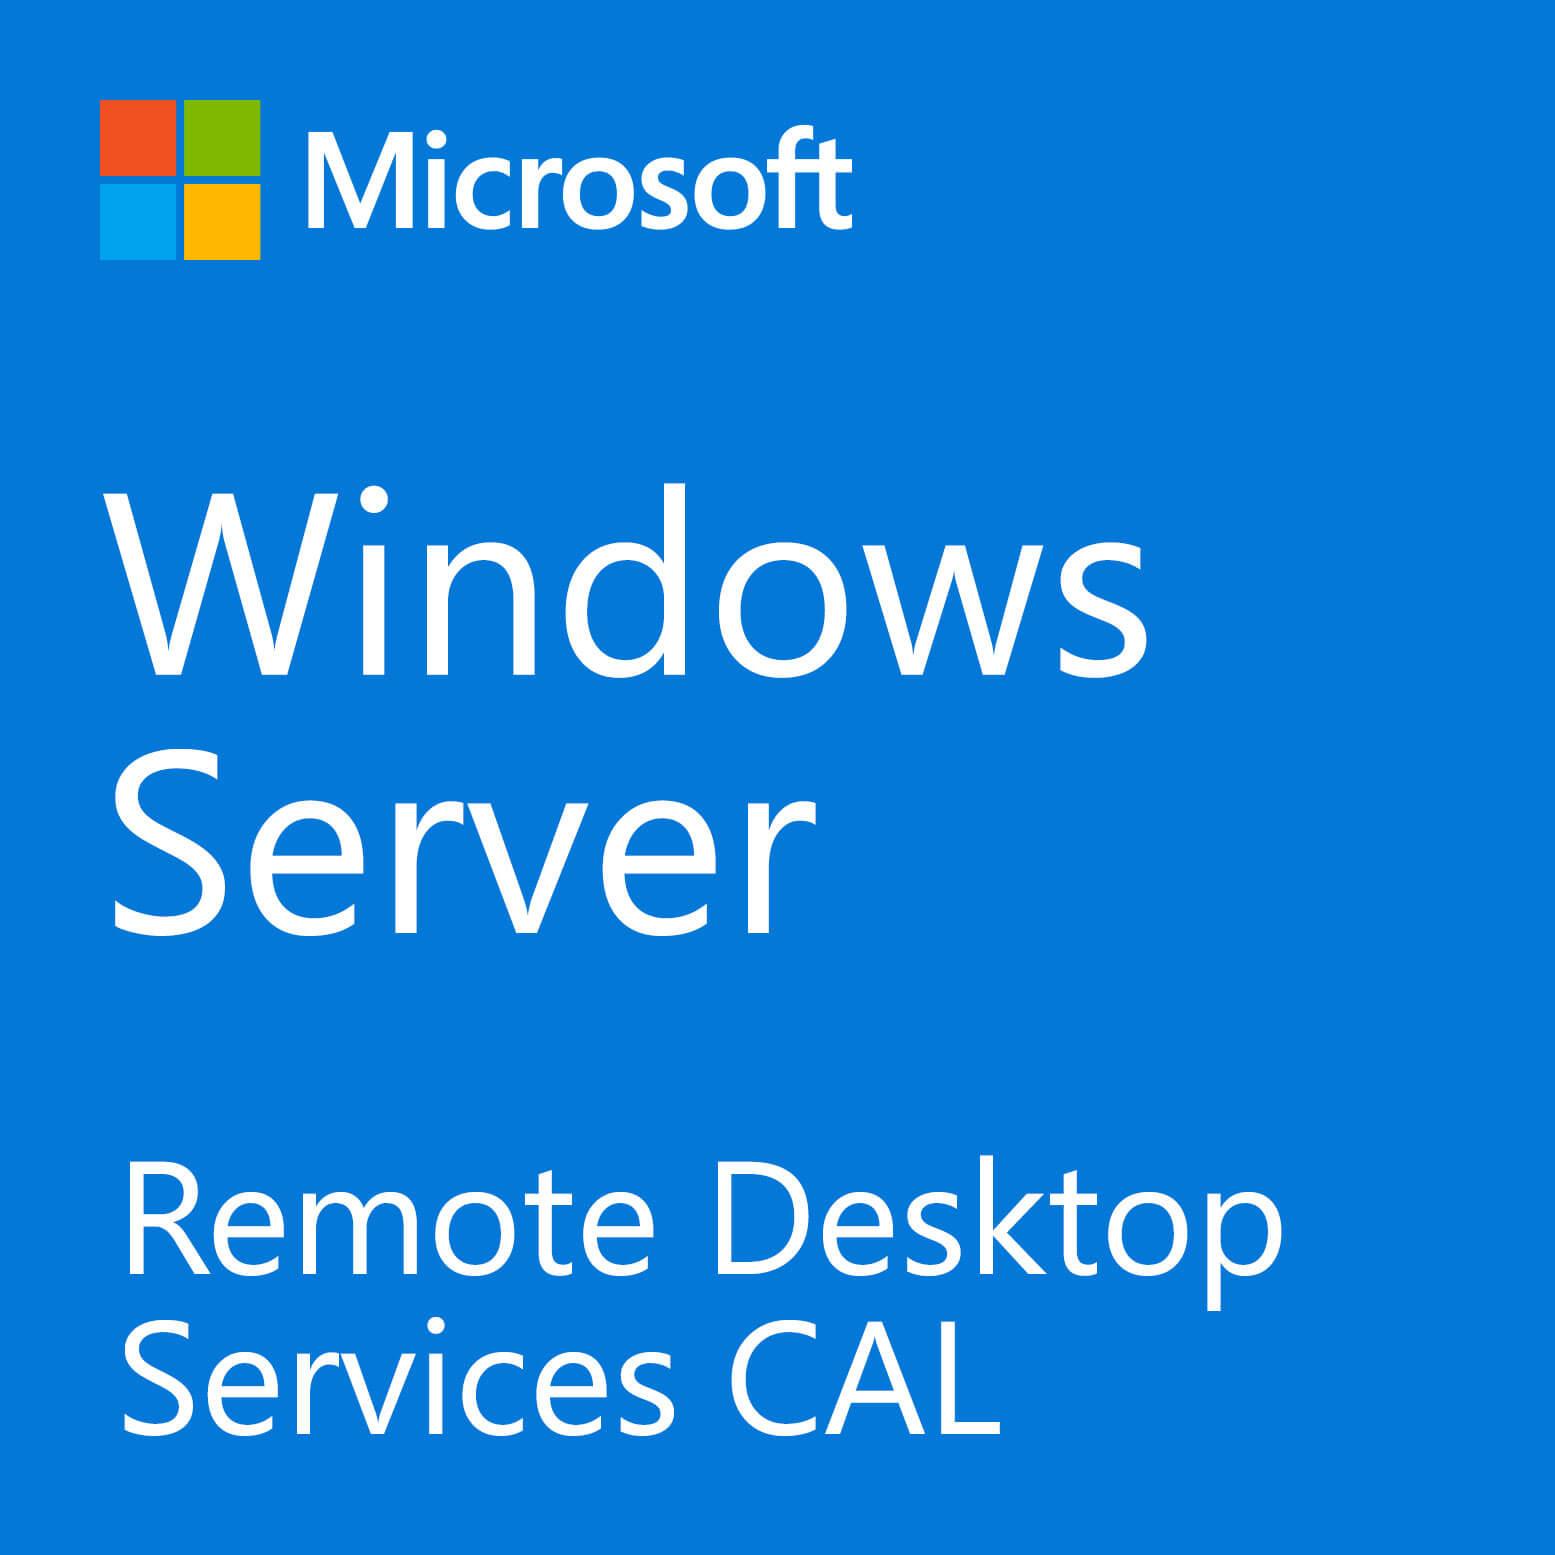 Windows Server 2016 RDS